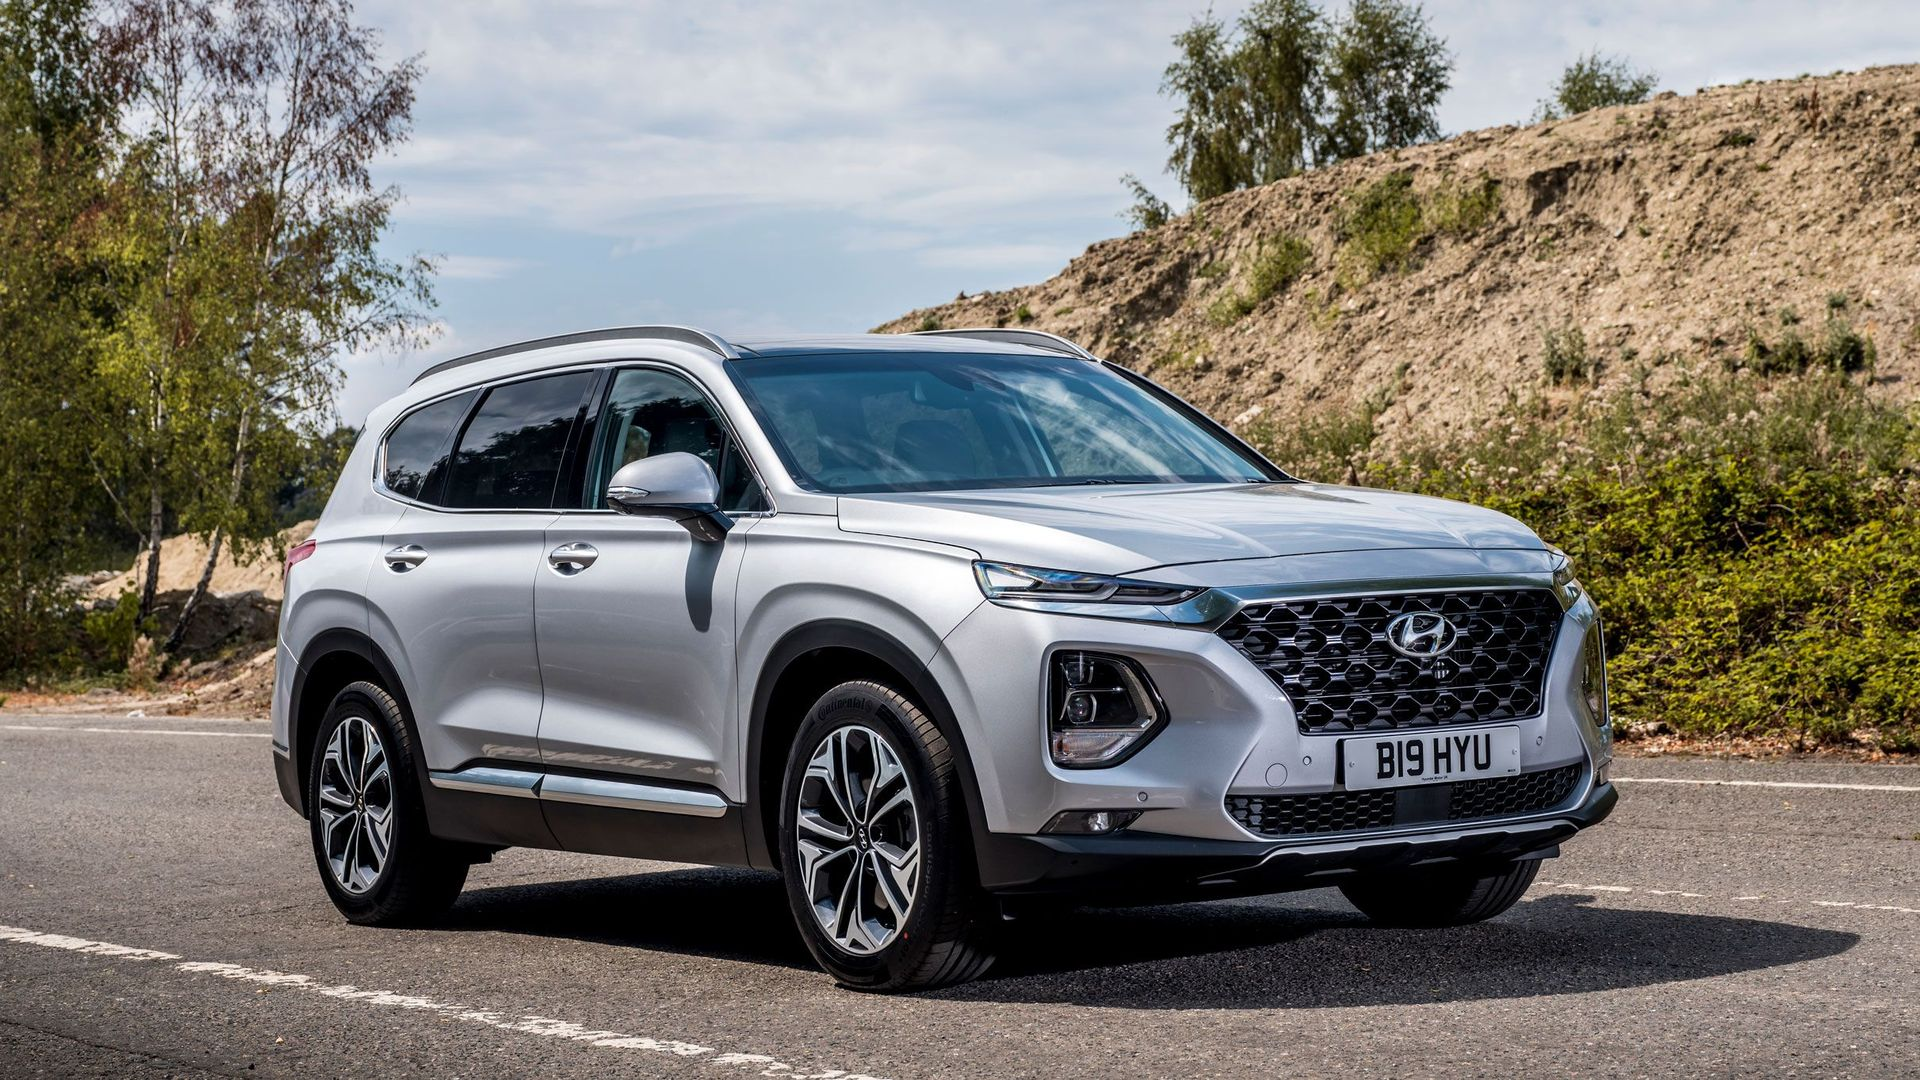 Hyundai Santa Fe CRDi image